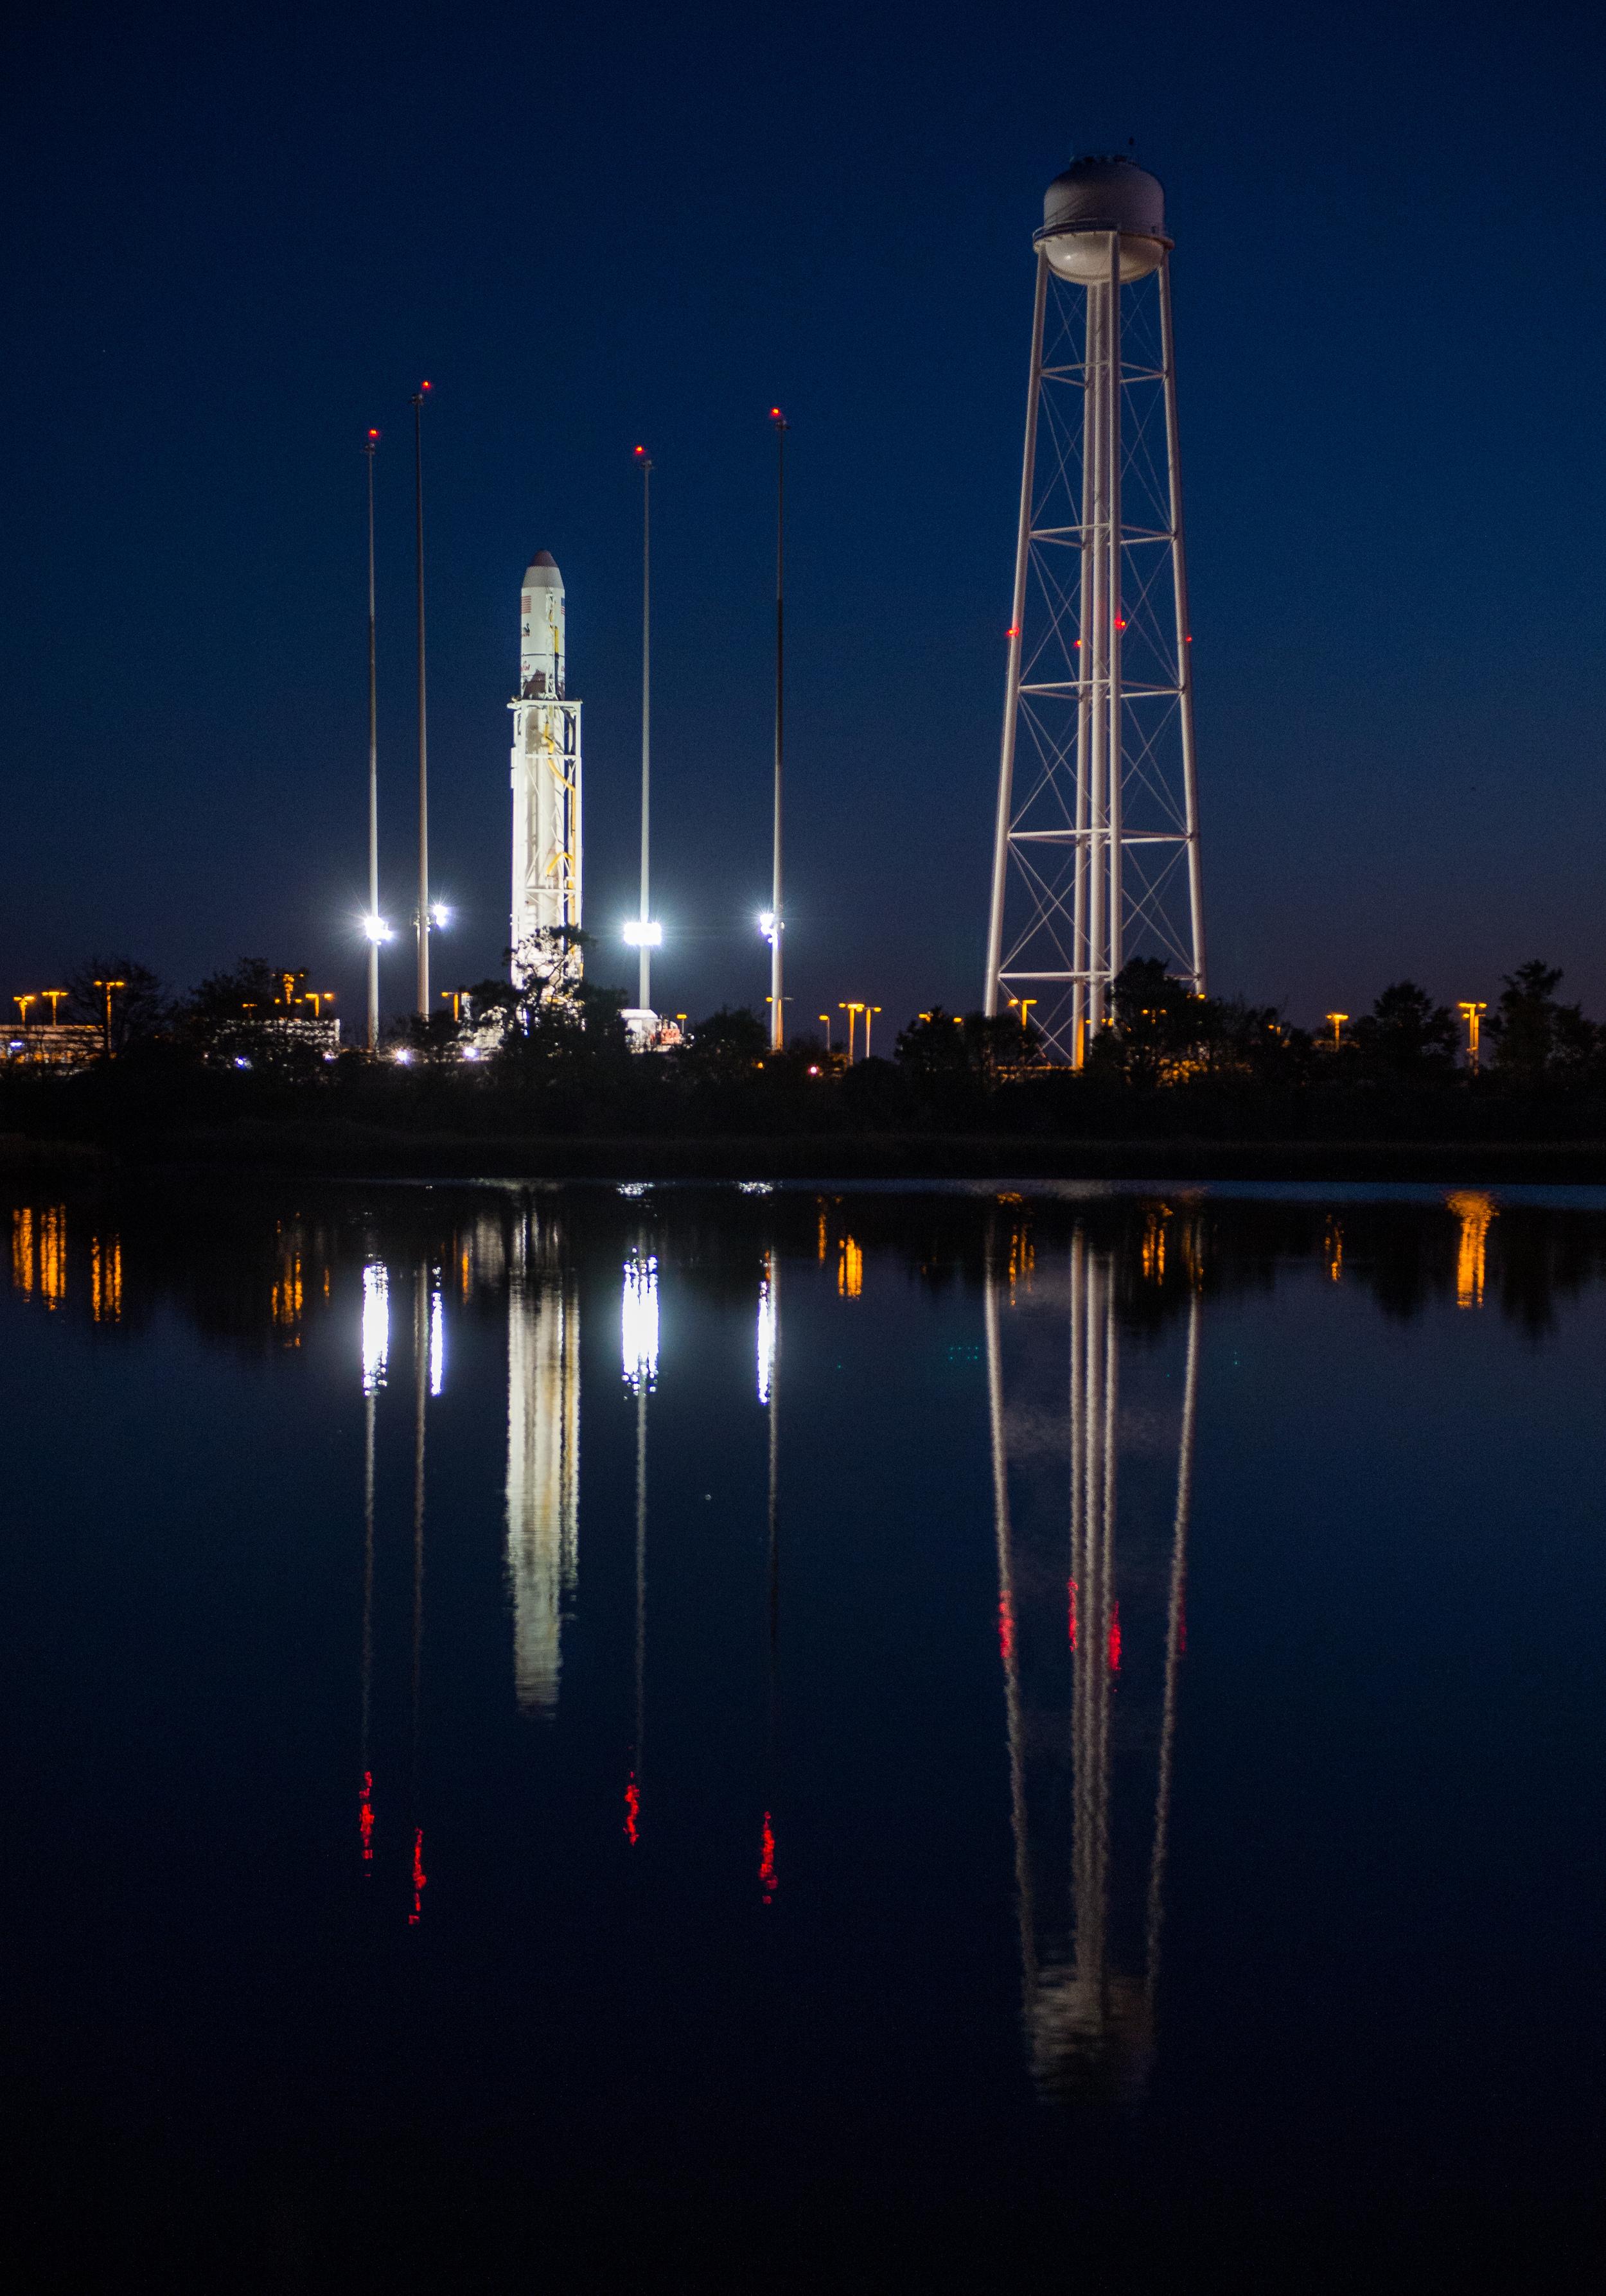 Orbital Science's Antares rocket on the launchpad in Virginia.  Credit:  Nasa